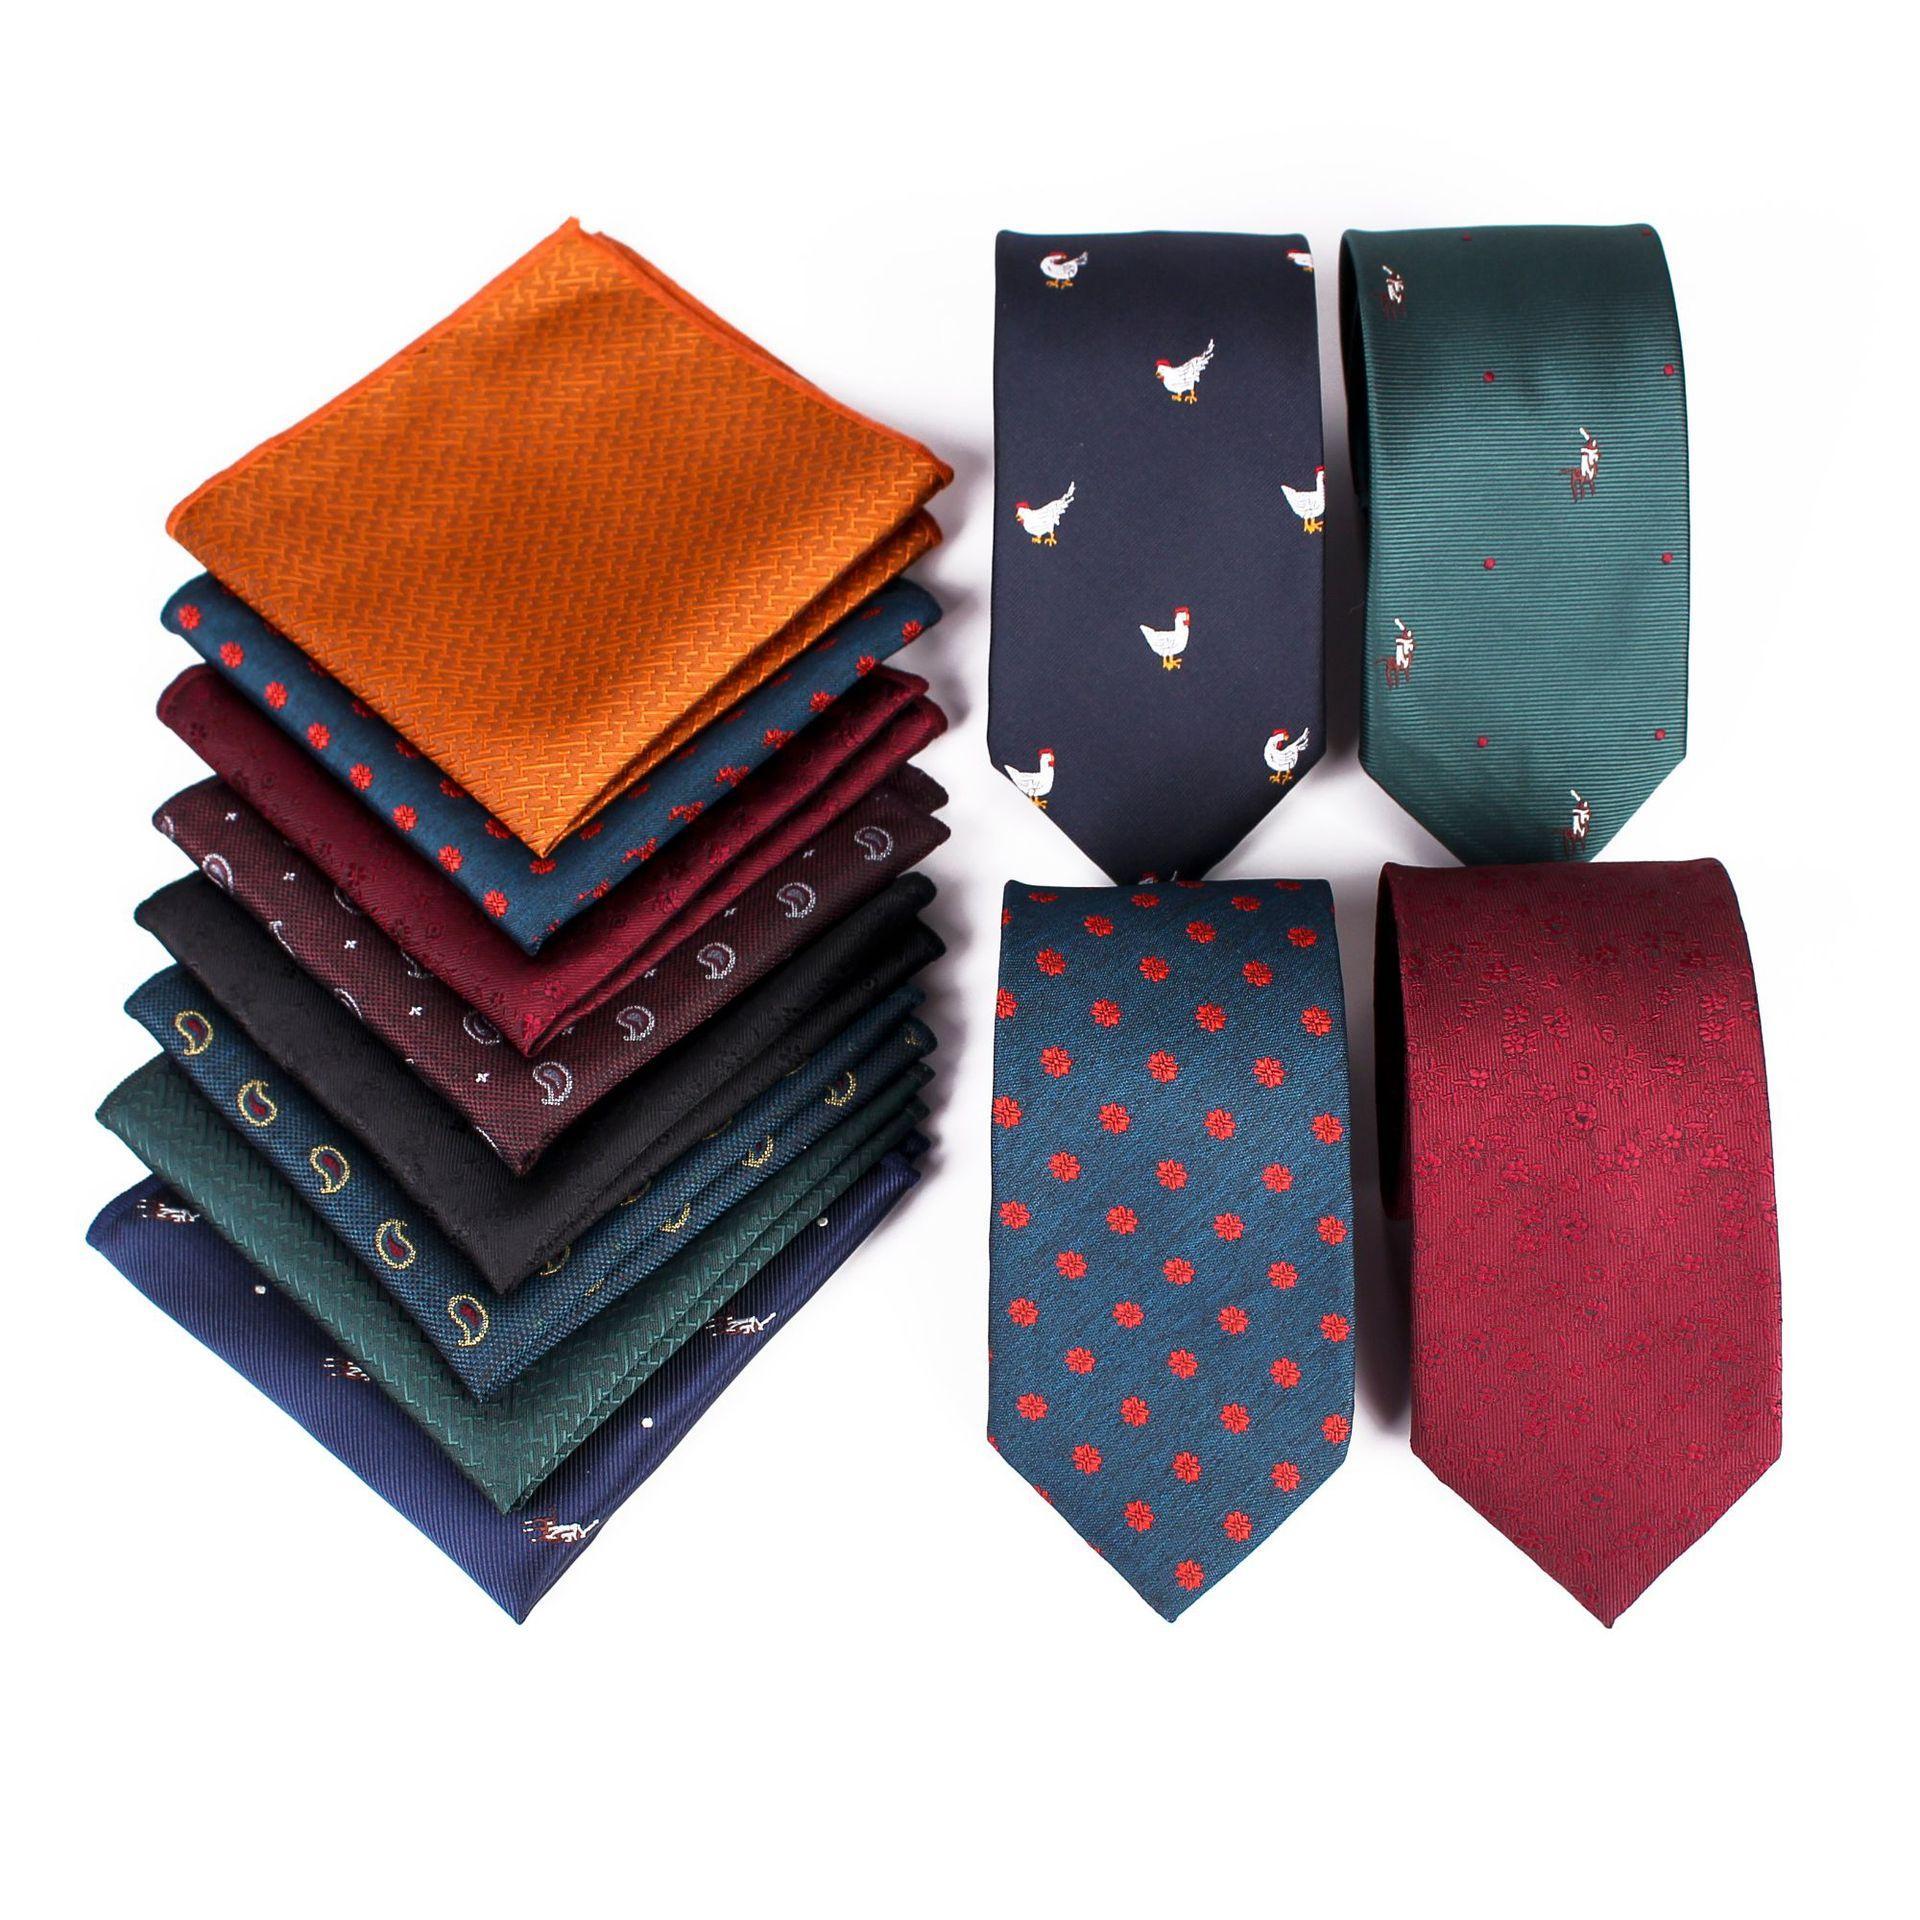 38296eecbd9e New necktie suit printed cotton tie pocket towel fashionable two setsTie  Men's Business Recreation Party is wearing a tie suit decorated wit